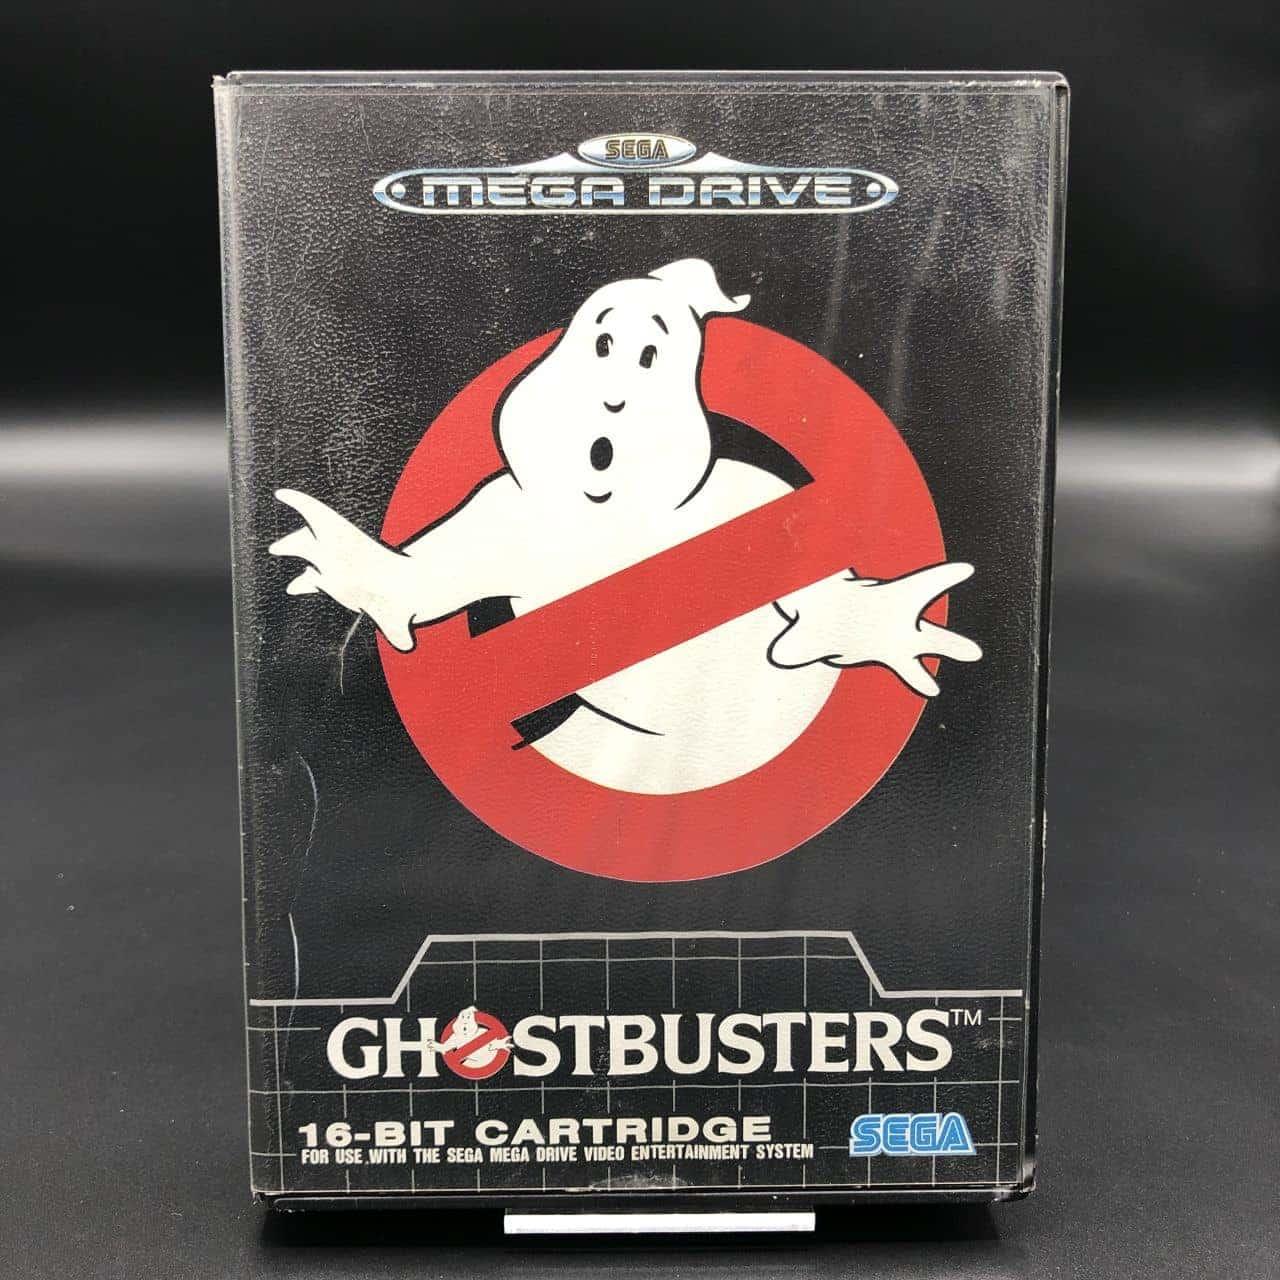 Ghostbusters (ohne Anleitung) (Gut) Sega Mega Drive